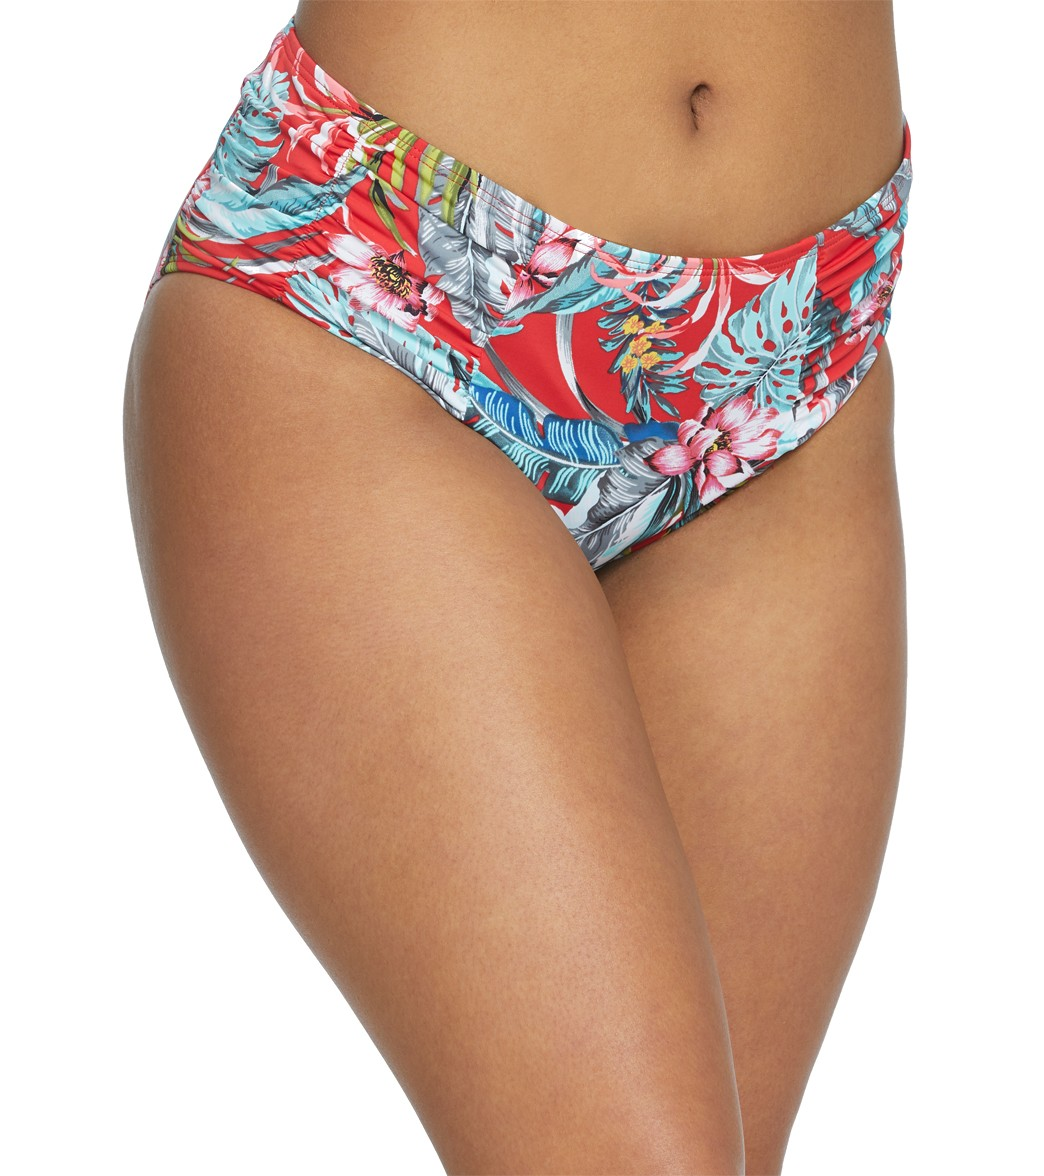 7fc30beb4e Skye Azalea Alessia High Waisted Bikini Bottom at SwimOutlet.com ...